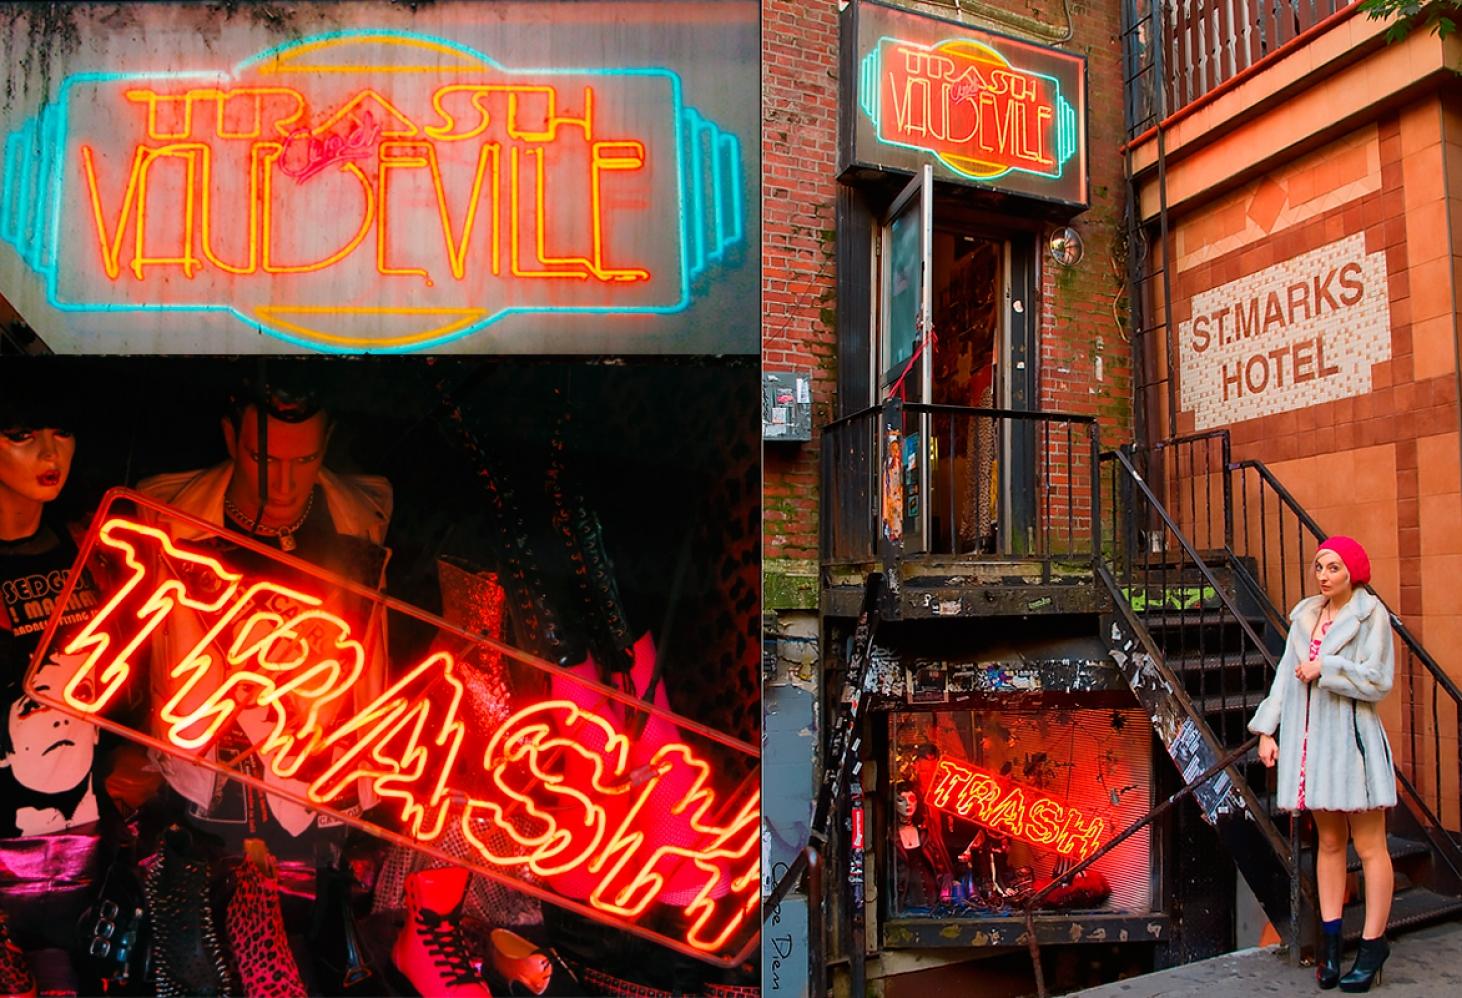 Trash and Vaudeville, Нью-Йорк